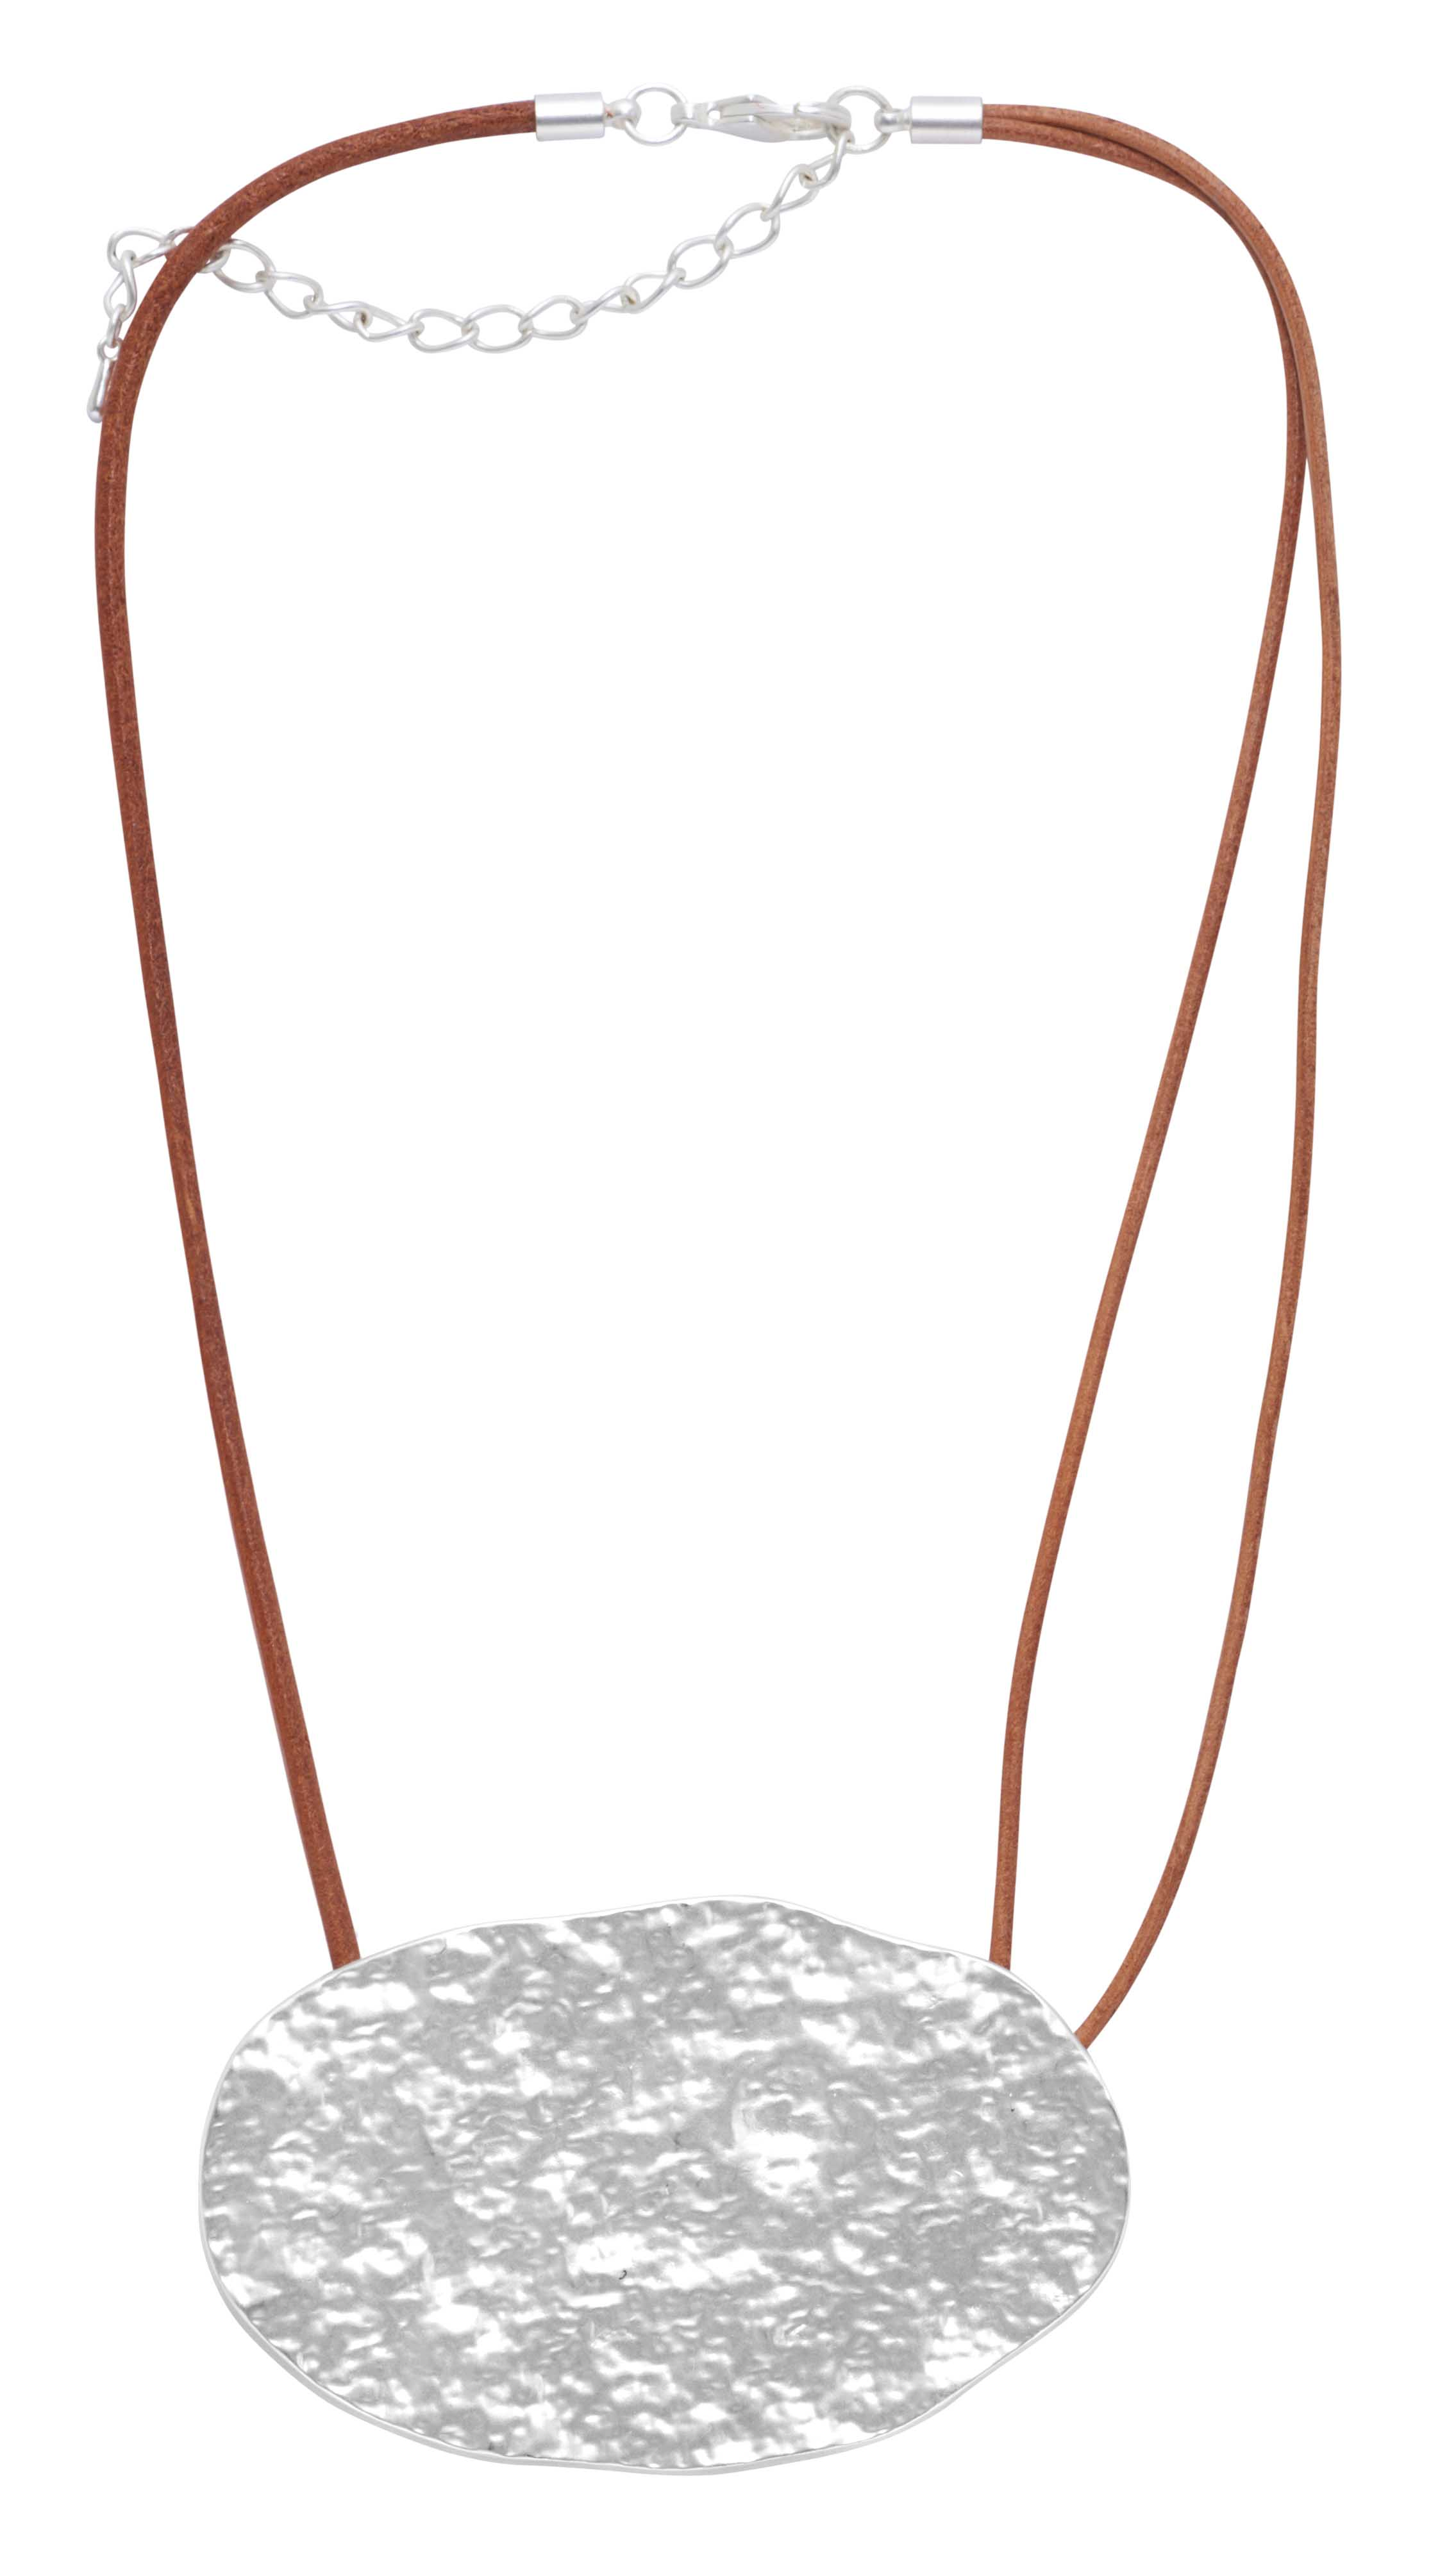 Колье на кожаном шнурке(9C927)Ronja<br>Дания, Dansk Smykkekunst<br><br>Длина колье 45 см<br>Размер декоративного элемента 7,5х4,5см.<br>